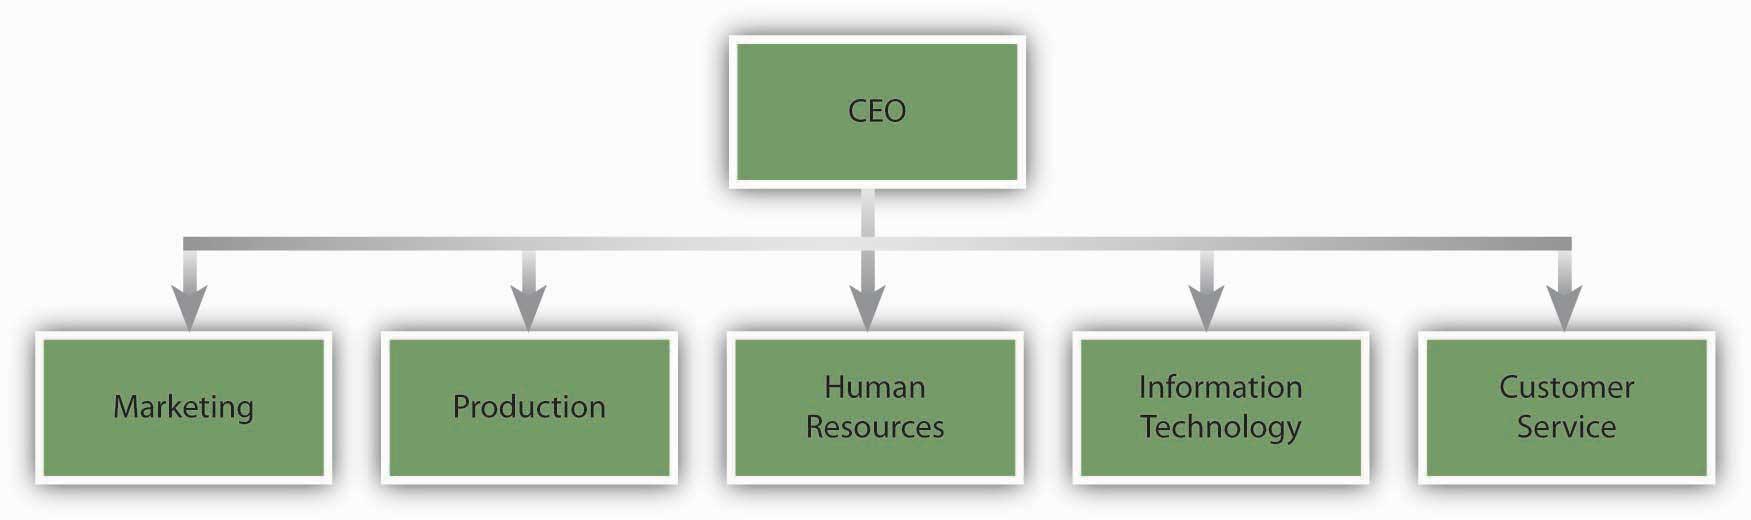 organizational structure and change rh 2012books lardbucket org flat organisational structure diagram